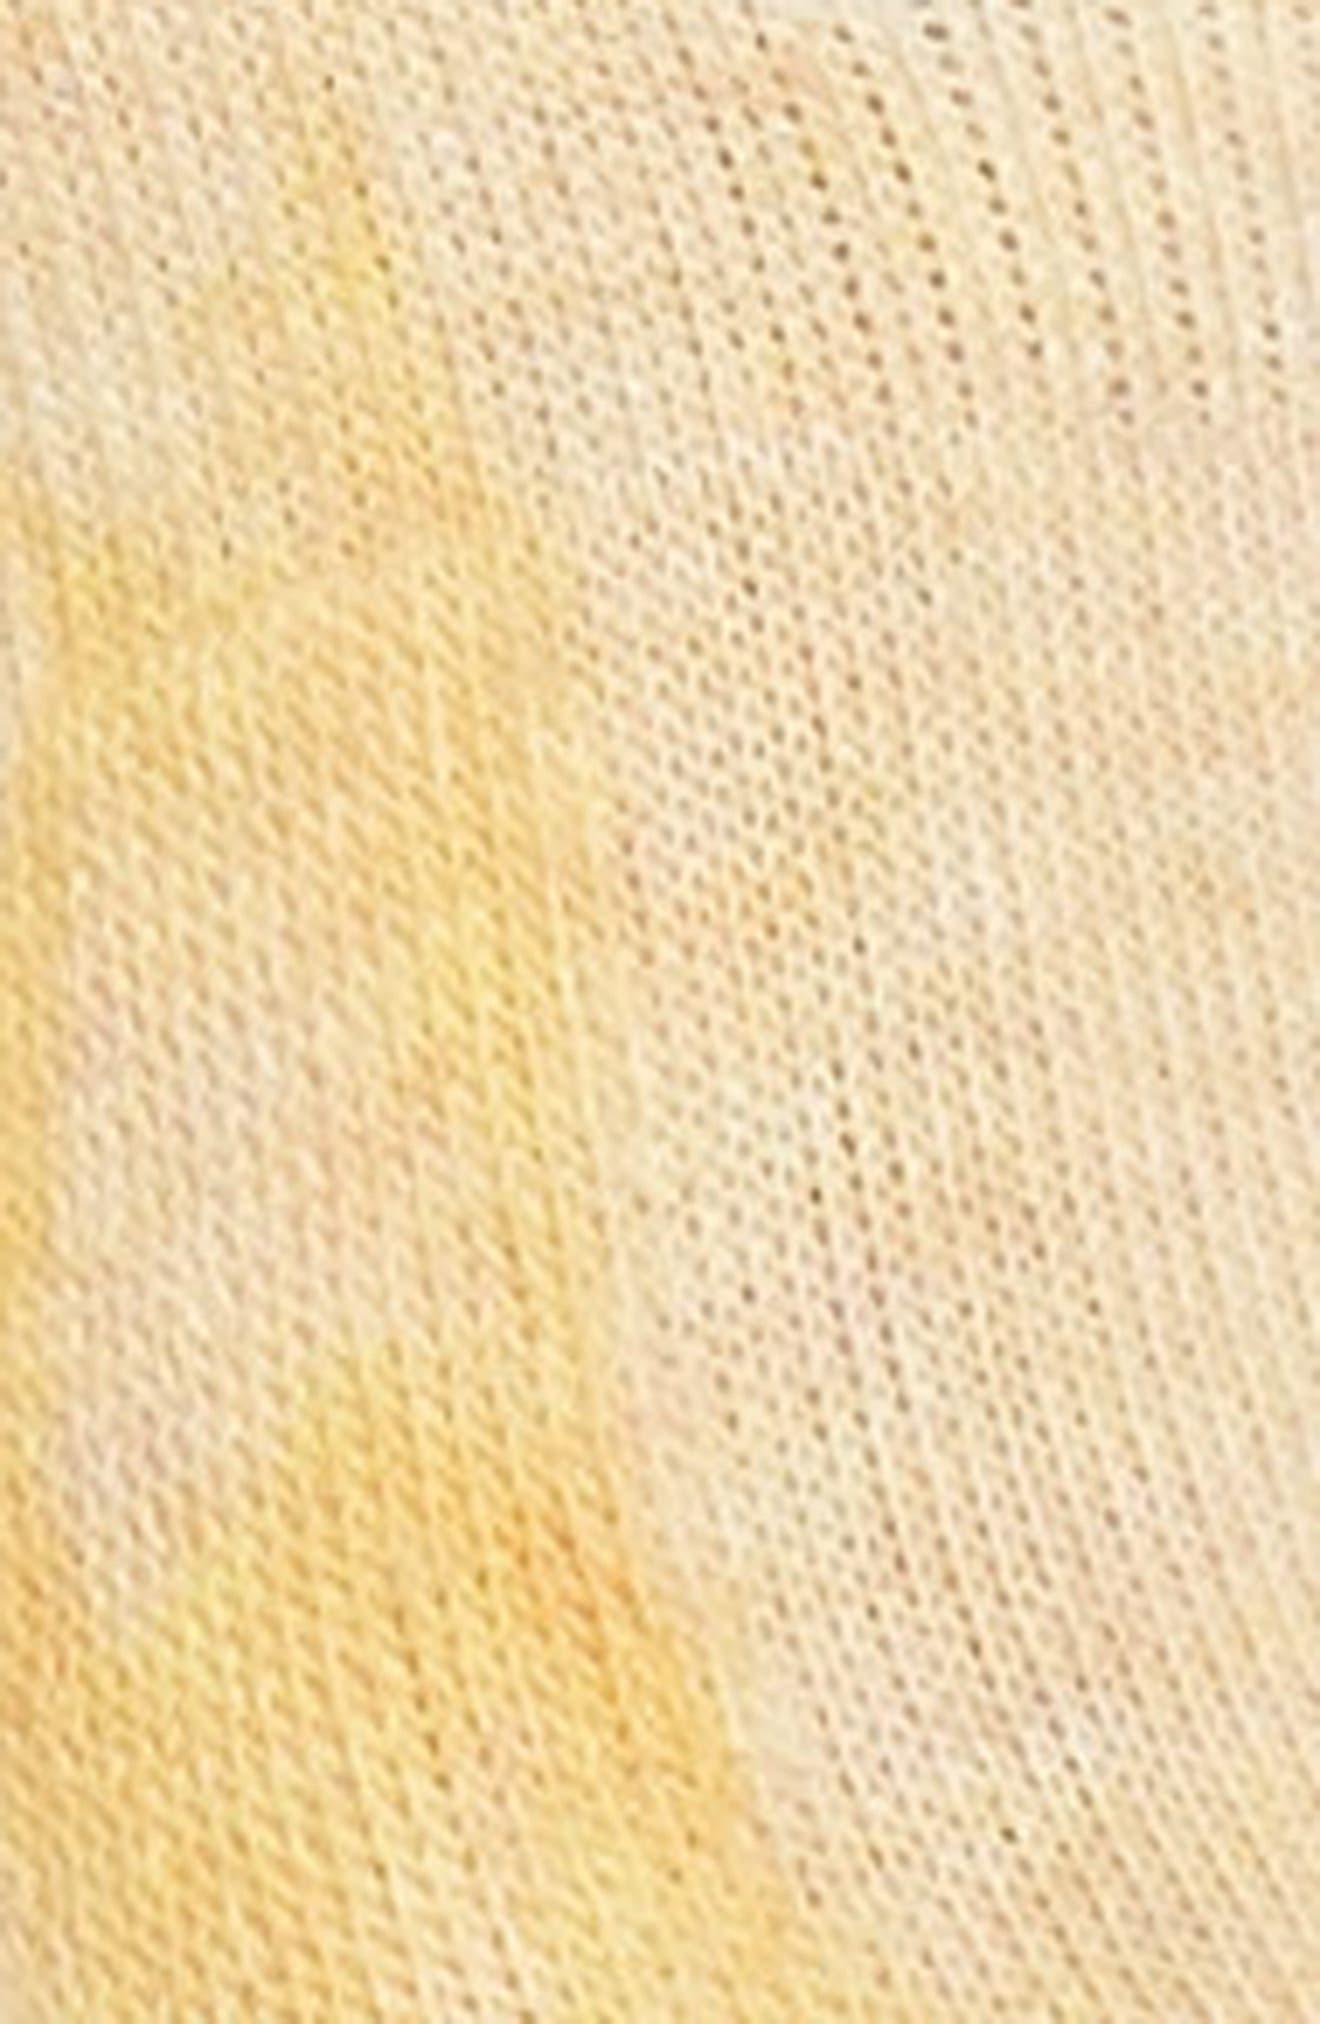 Lemon No-Show Socks,                             Alternate thumbnail 2, color,                             700